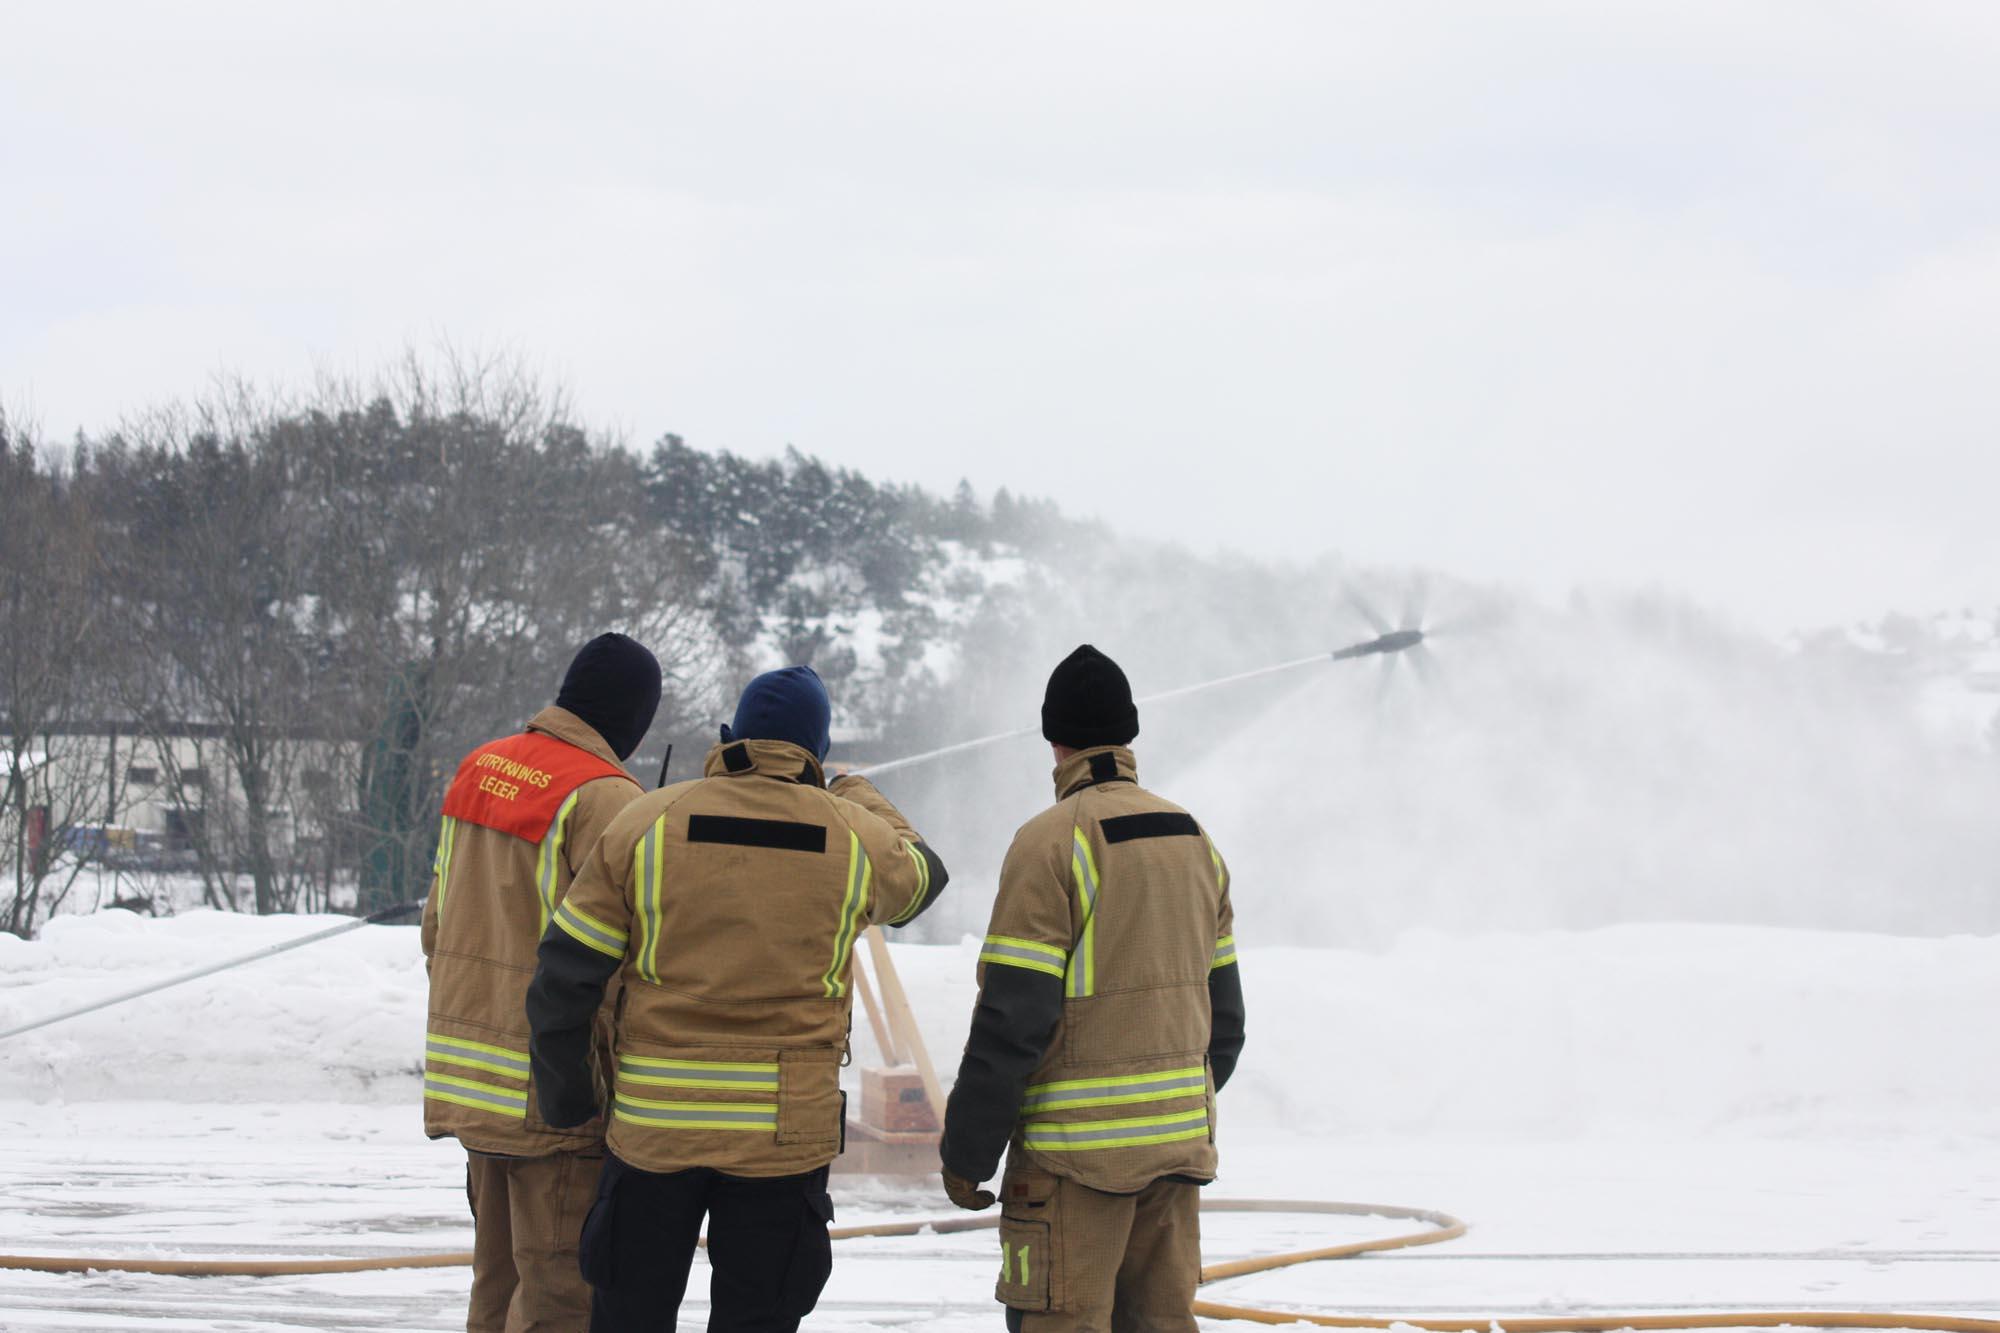 Firefighters operating Firelance